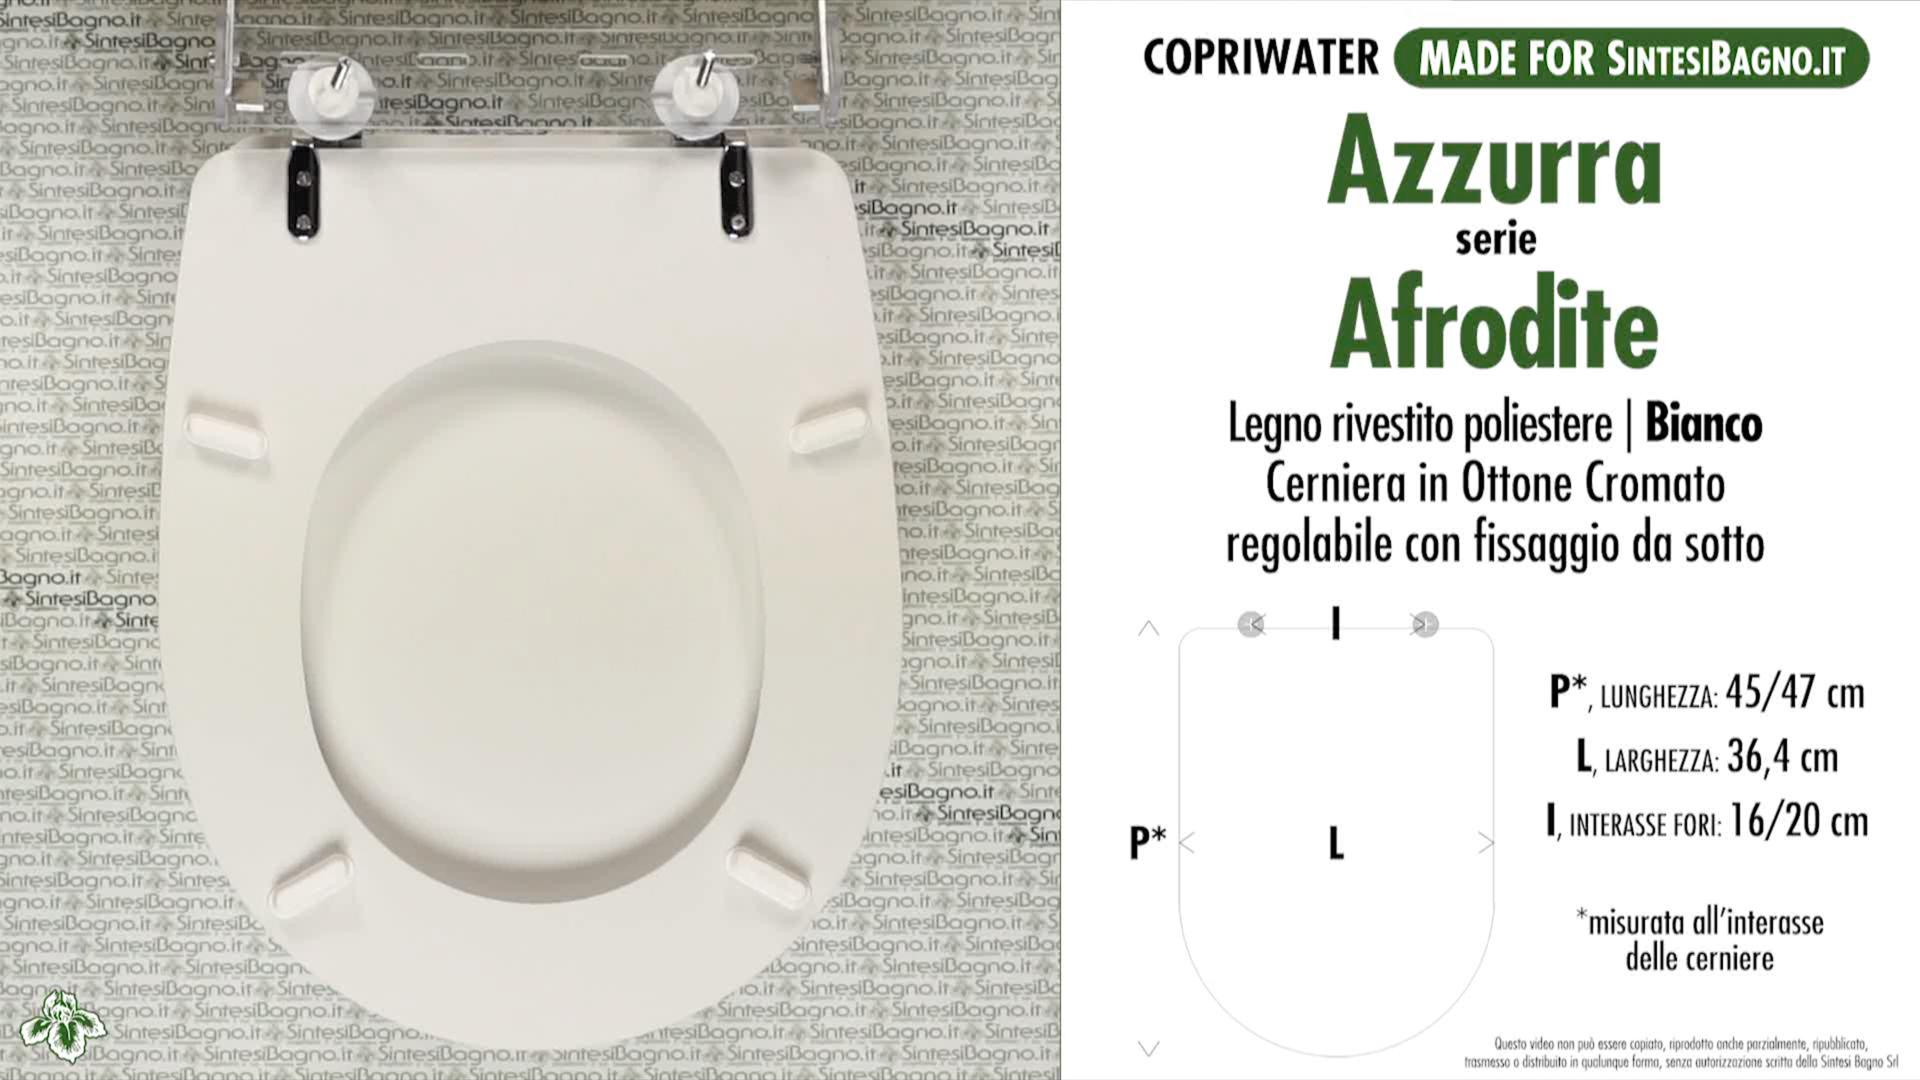 SCHEDA TECNICA MISURE copriwater AZZURRA AFRODITE